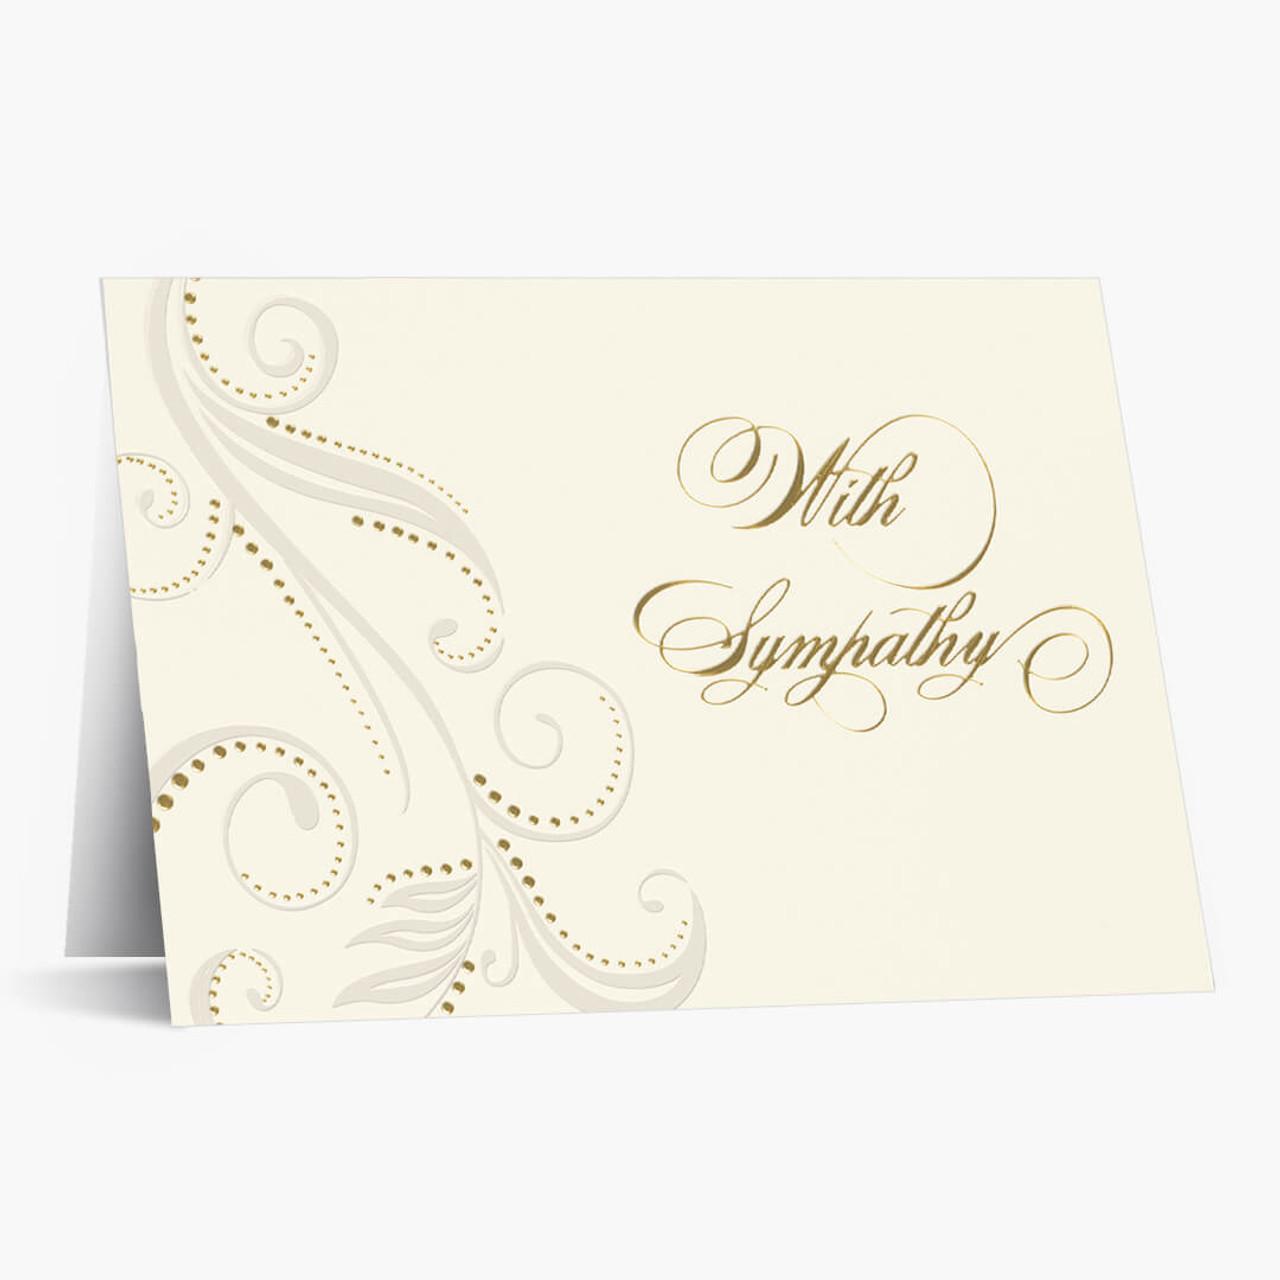 Golden Sympathy Greeting Card